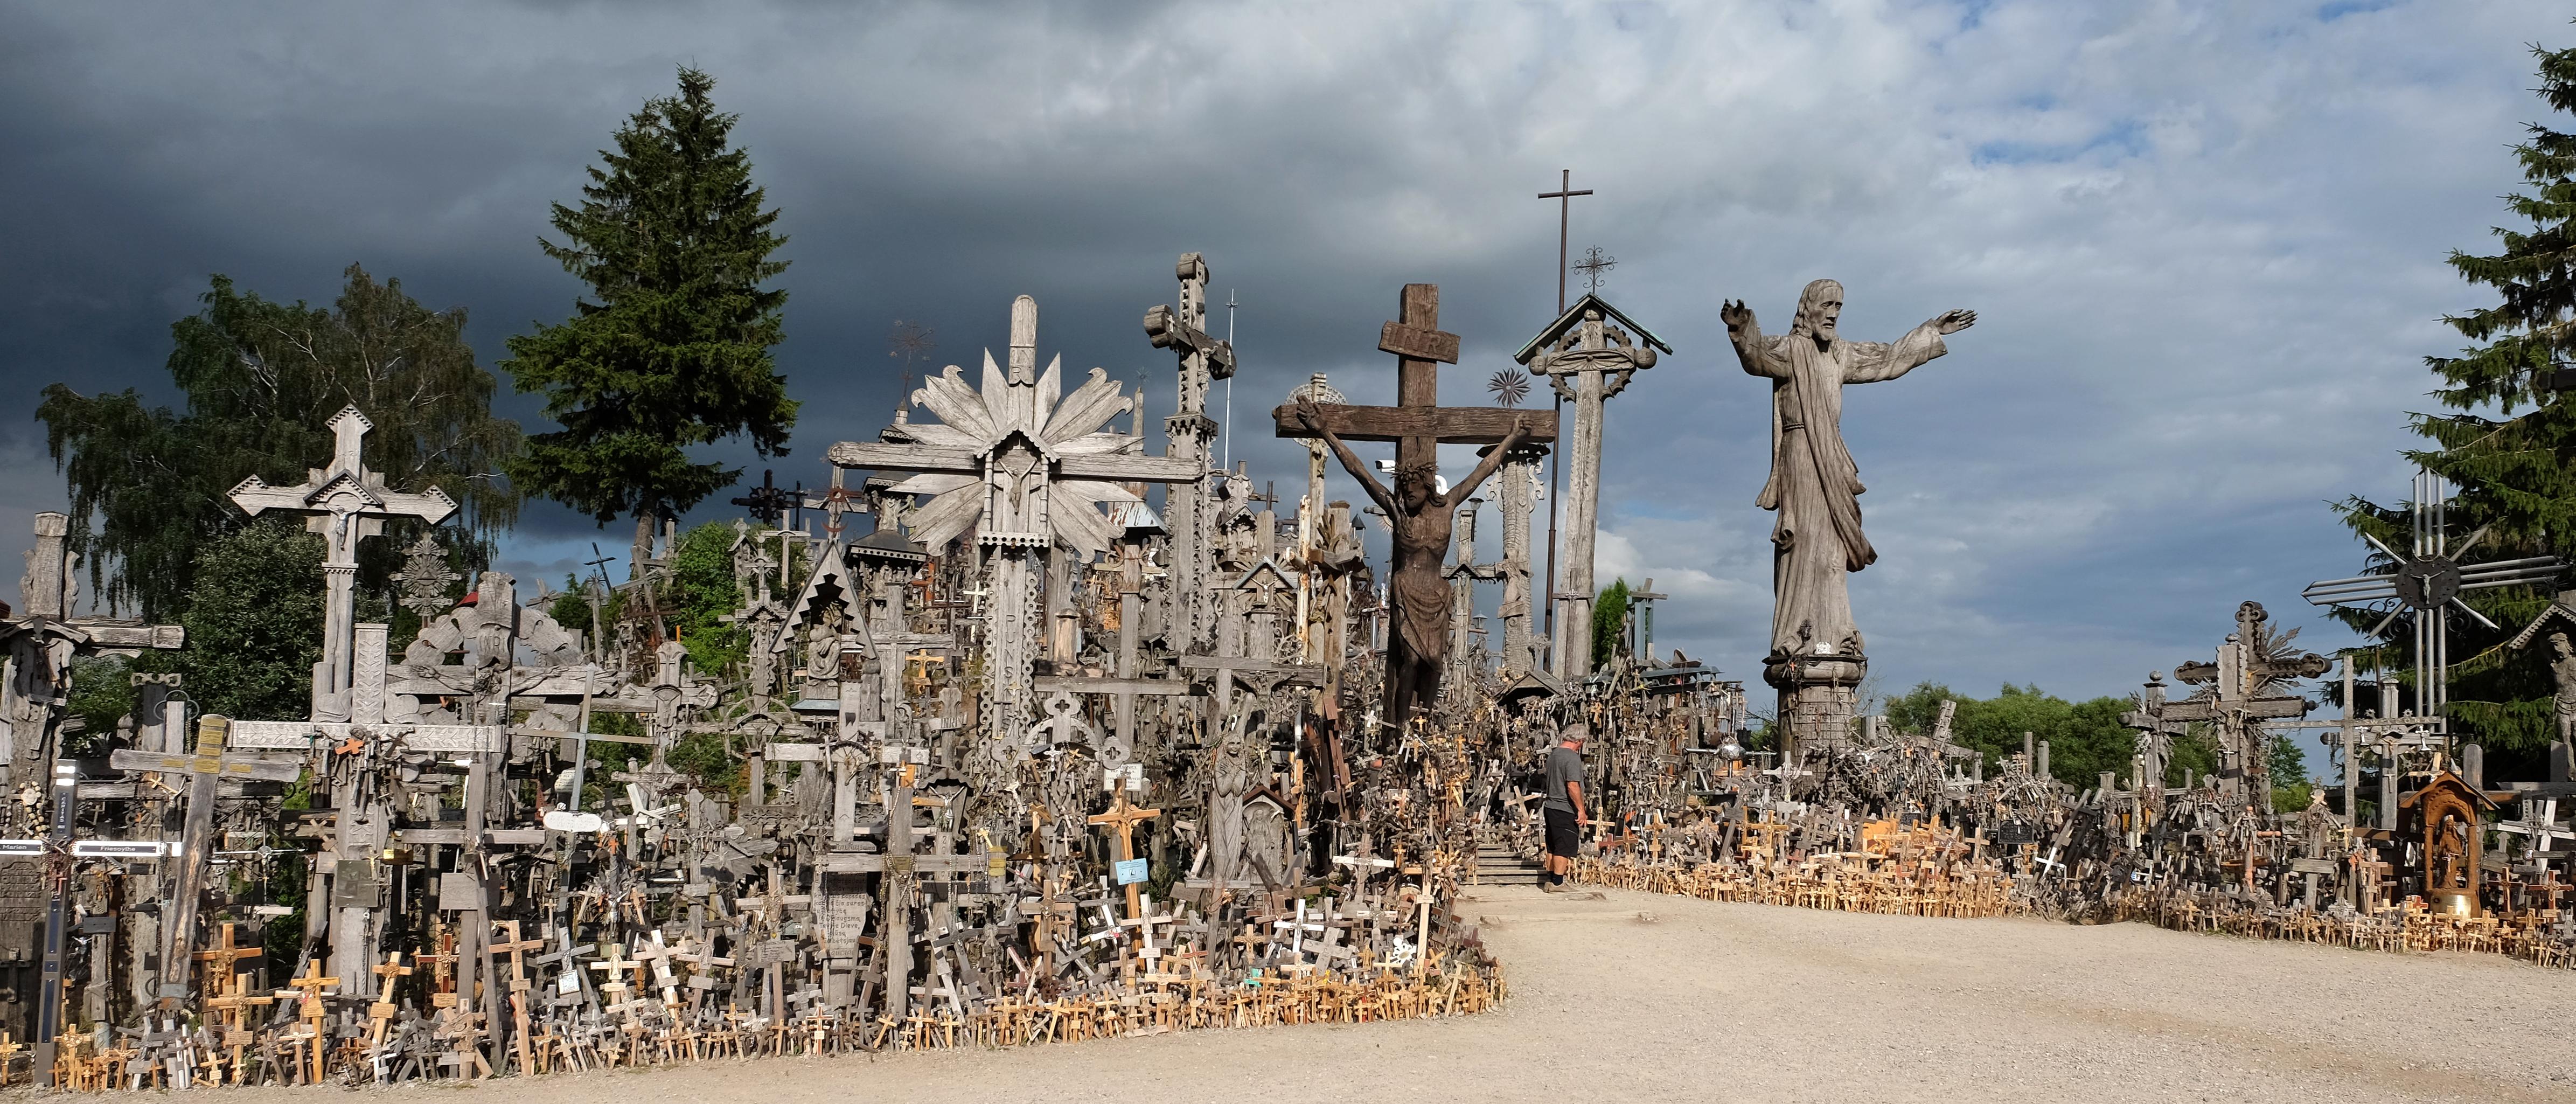 Berg der Kreuze/Litauen